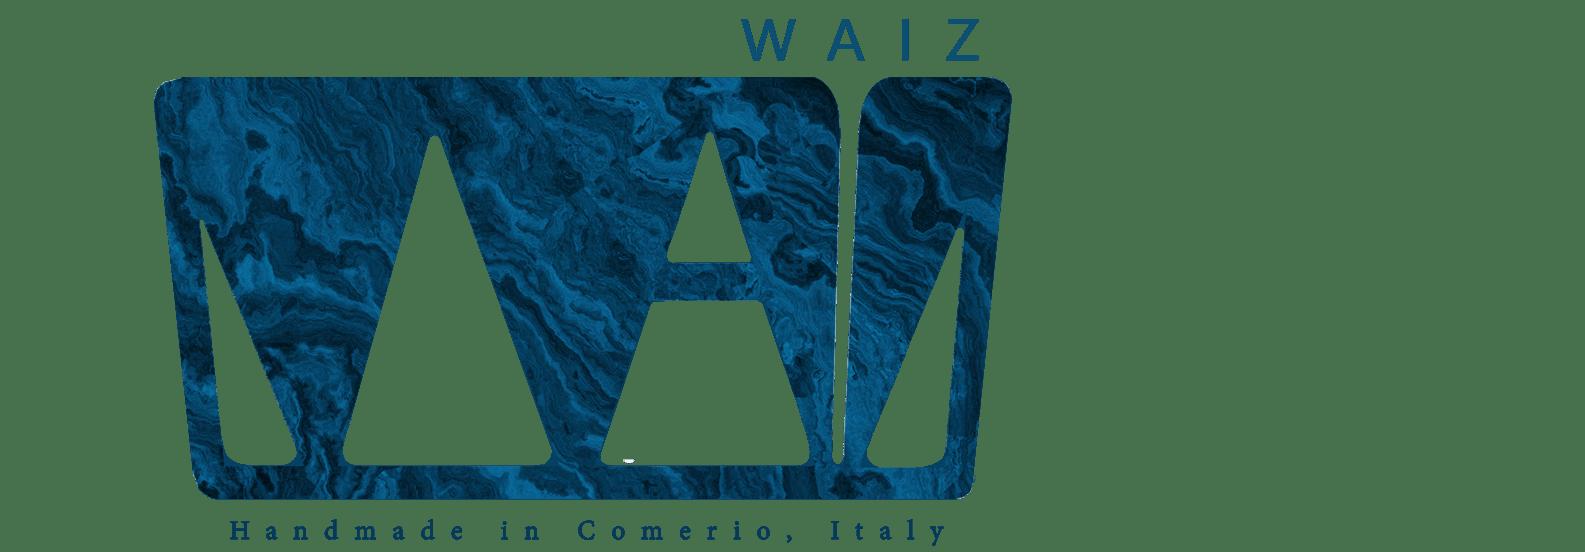 waiz-plucked-instruments